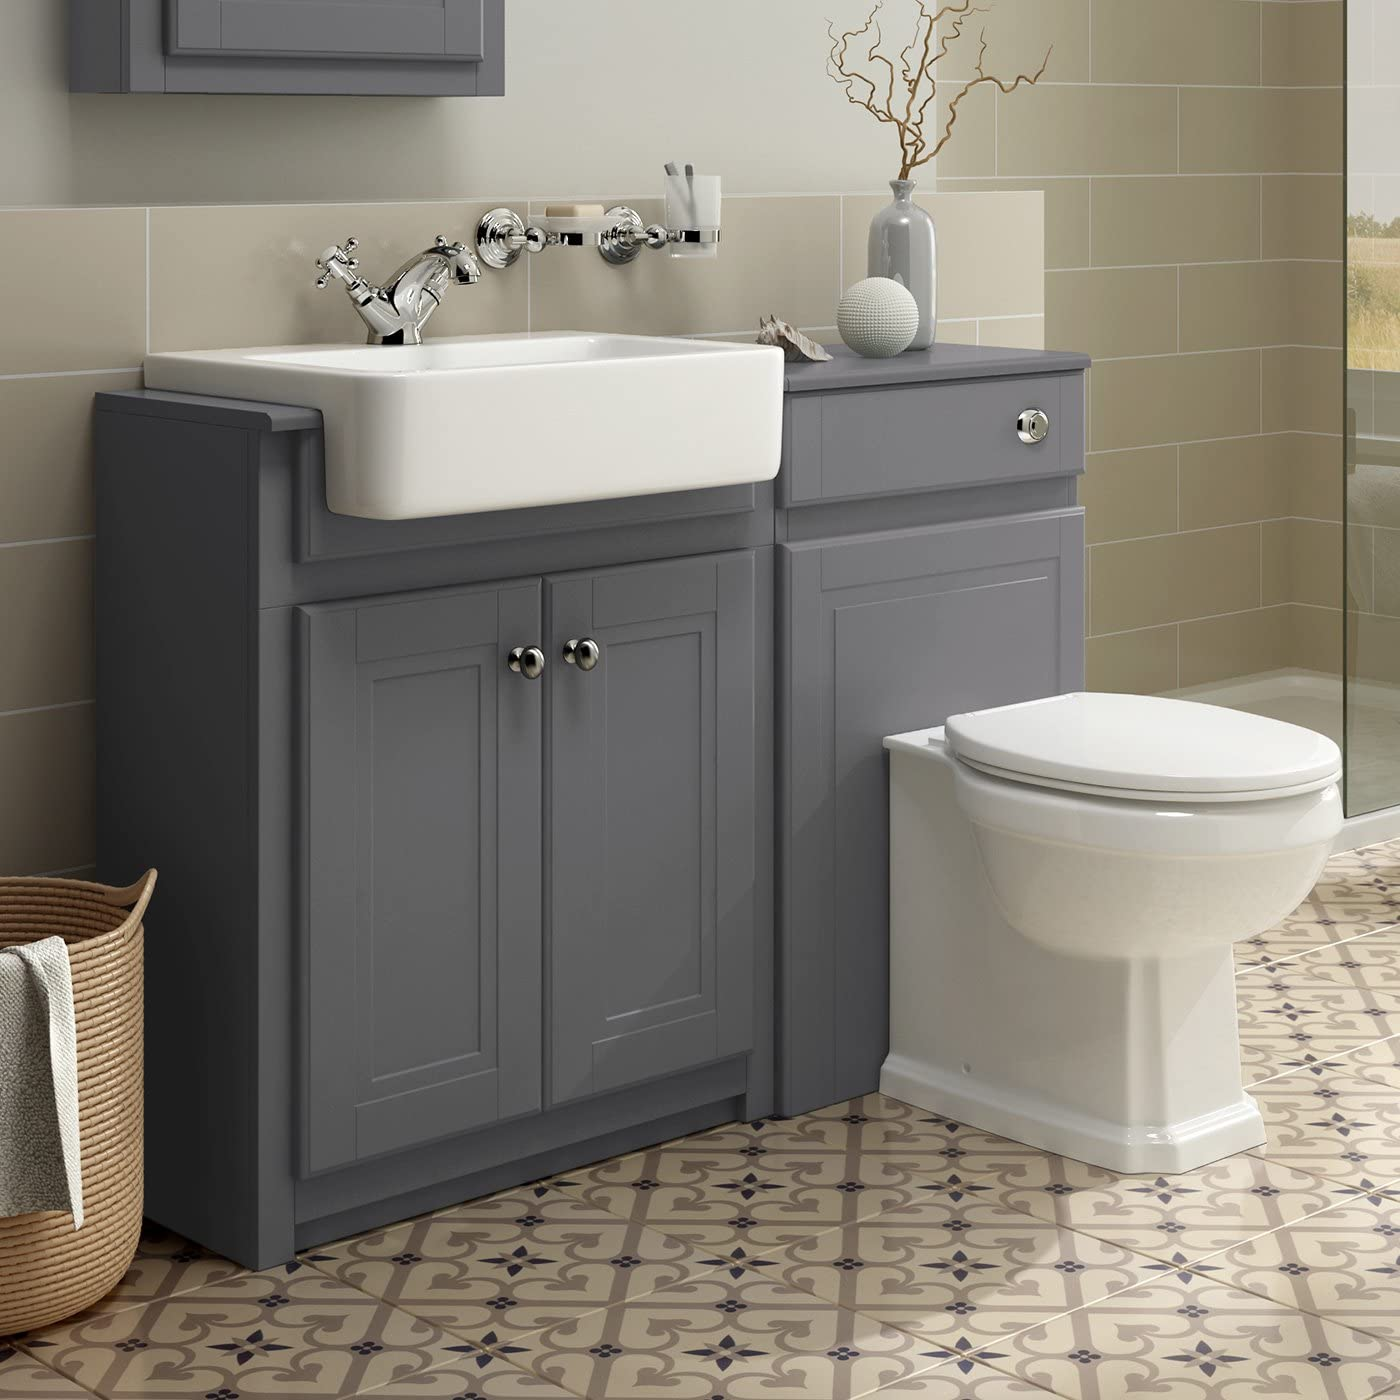 10mm Combined Vanity Unit Toilet Basin Grey Bathroom Furniture Storage  Sink